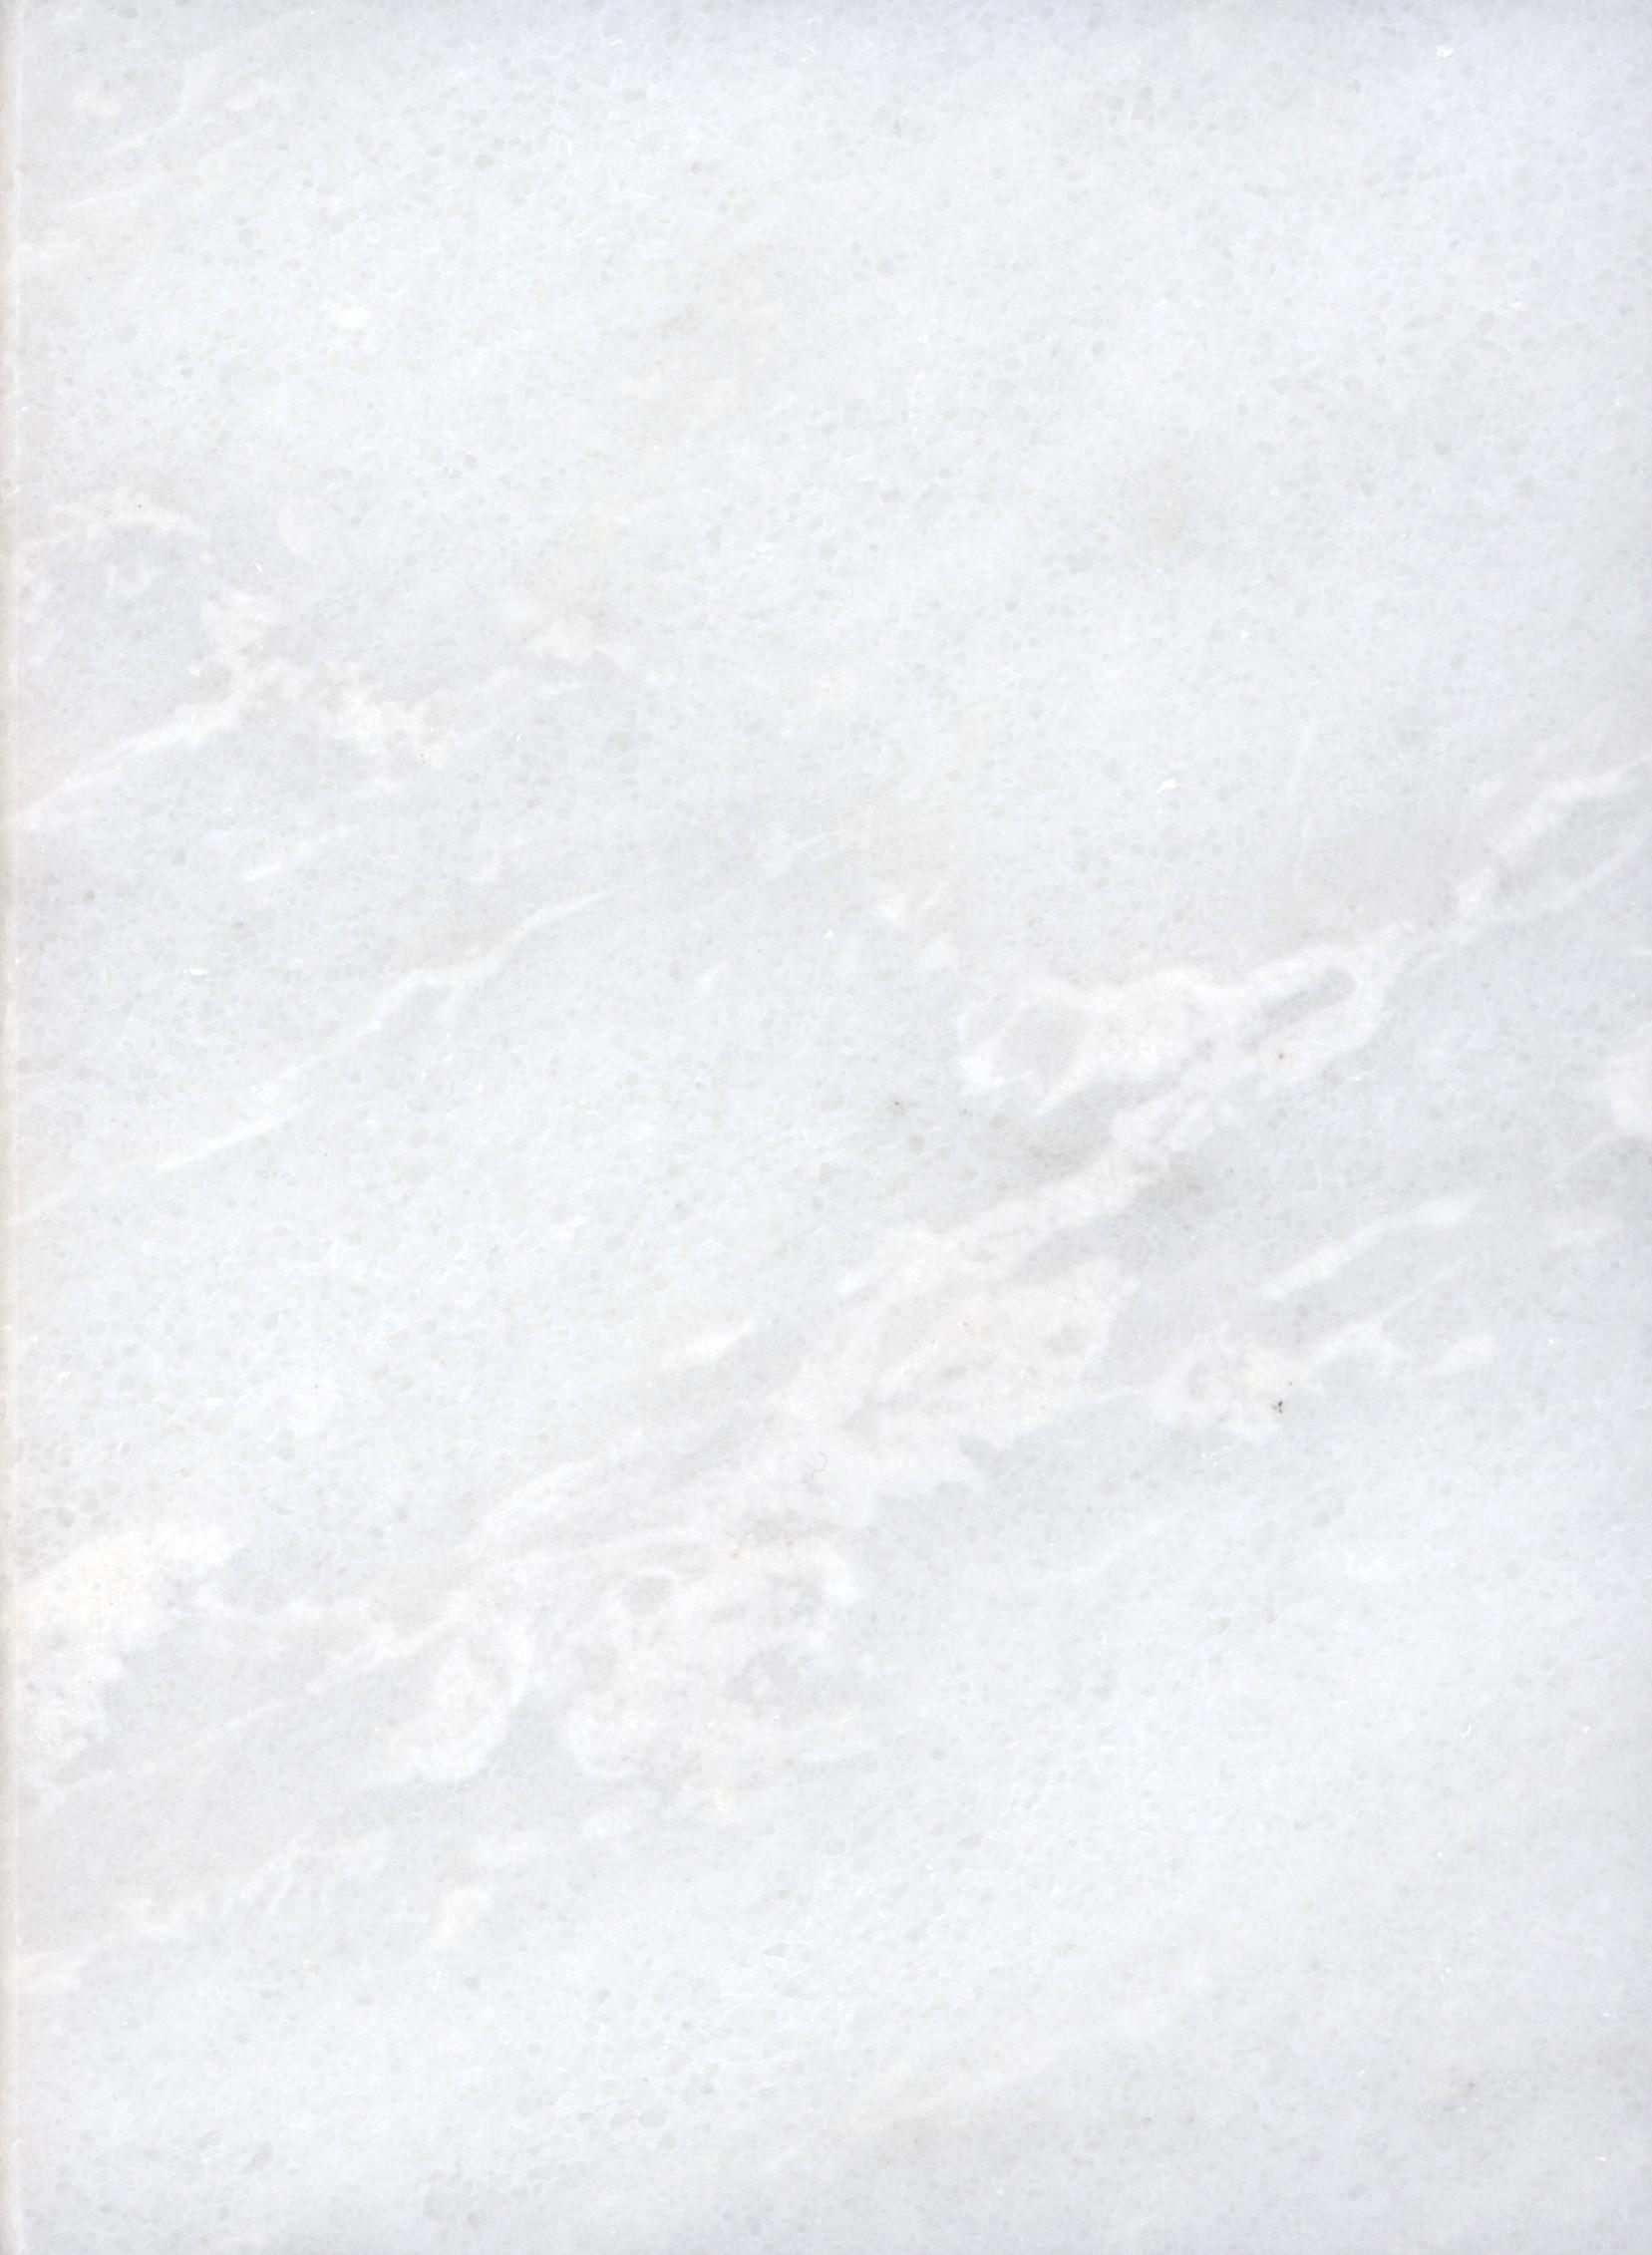 Stock Illustration Outline Medieval Bow Arrow Icon Illustration Vector Monochrome Contour Wooden Isolated Black White Background Image62739199 besides 19479762 additionally Dibujos Para Colorear De La Reina additionally Ohtuseks Varvimiseks Minu Vaikesed Ponid additionally Marmor. on armor of